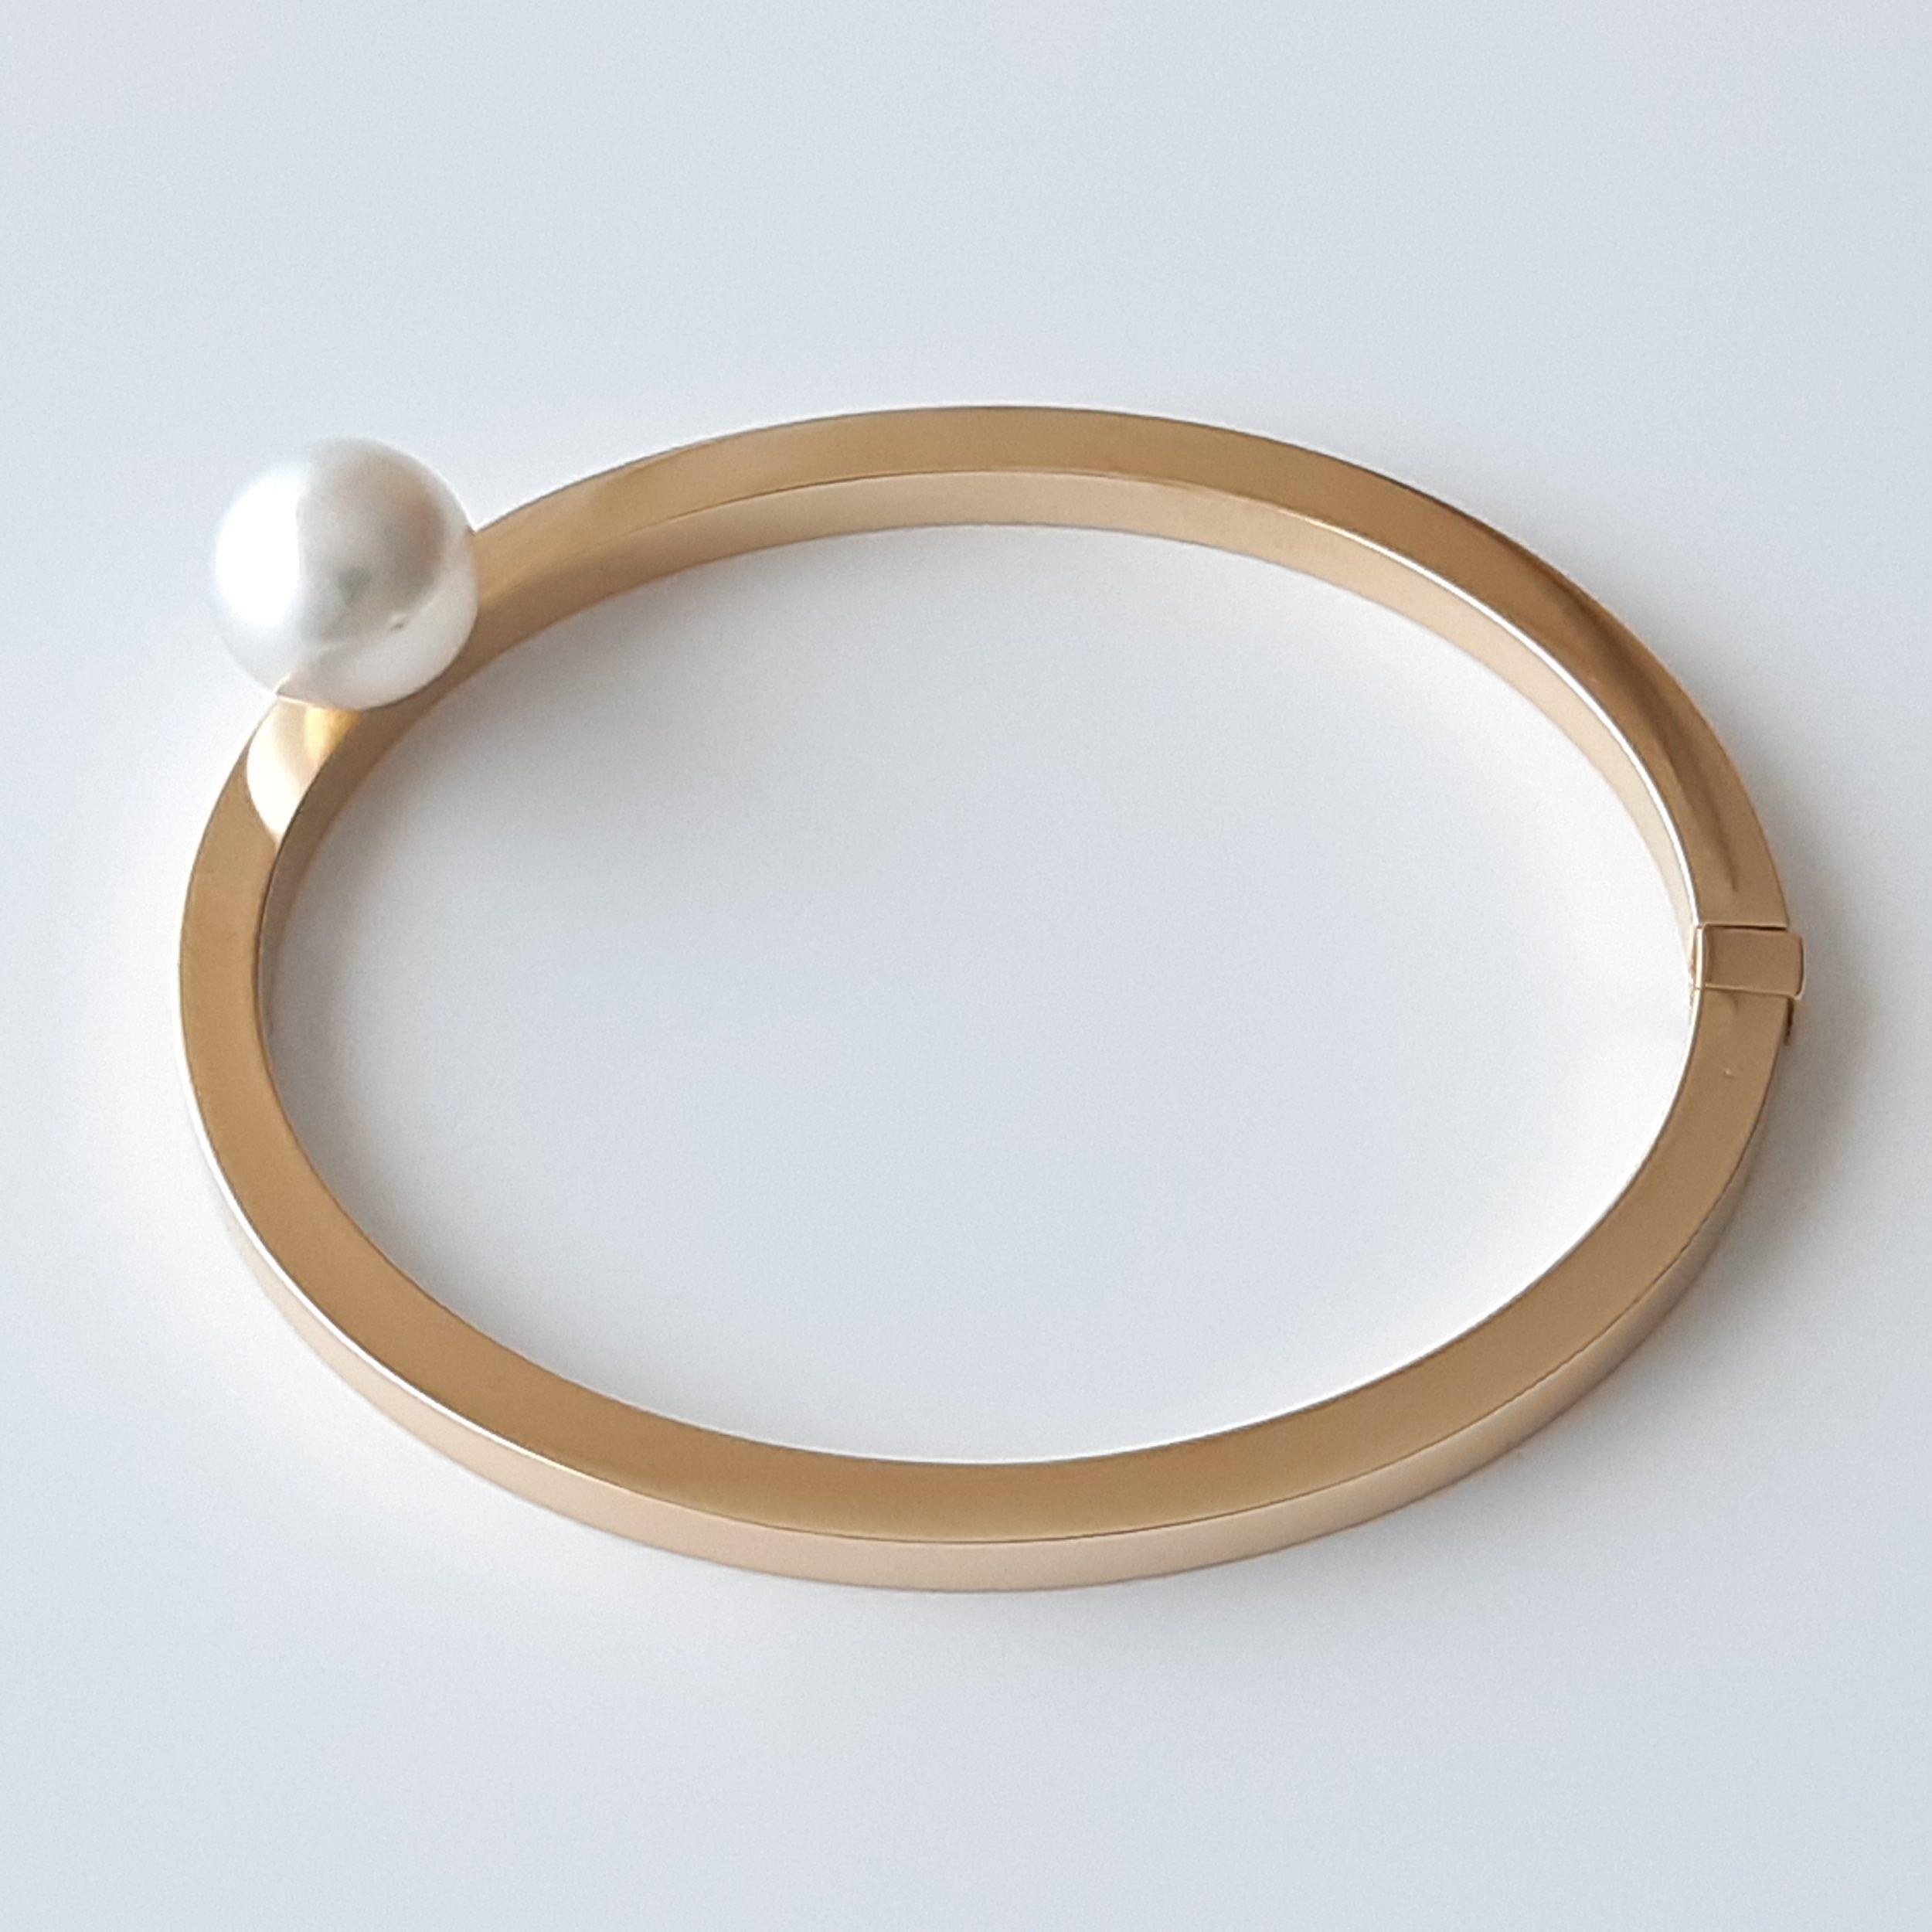 Brazalete perla australiana 734